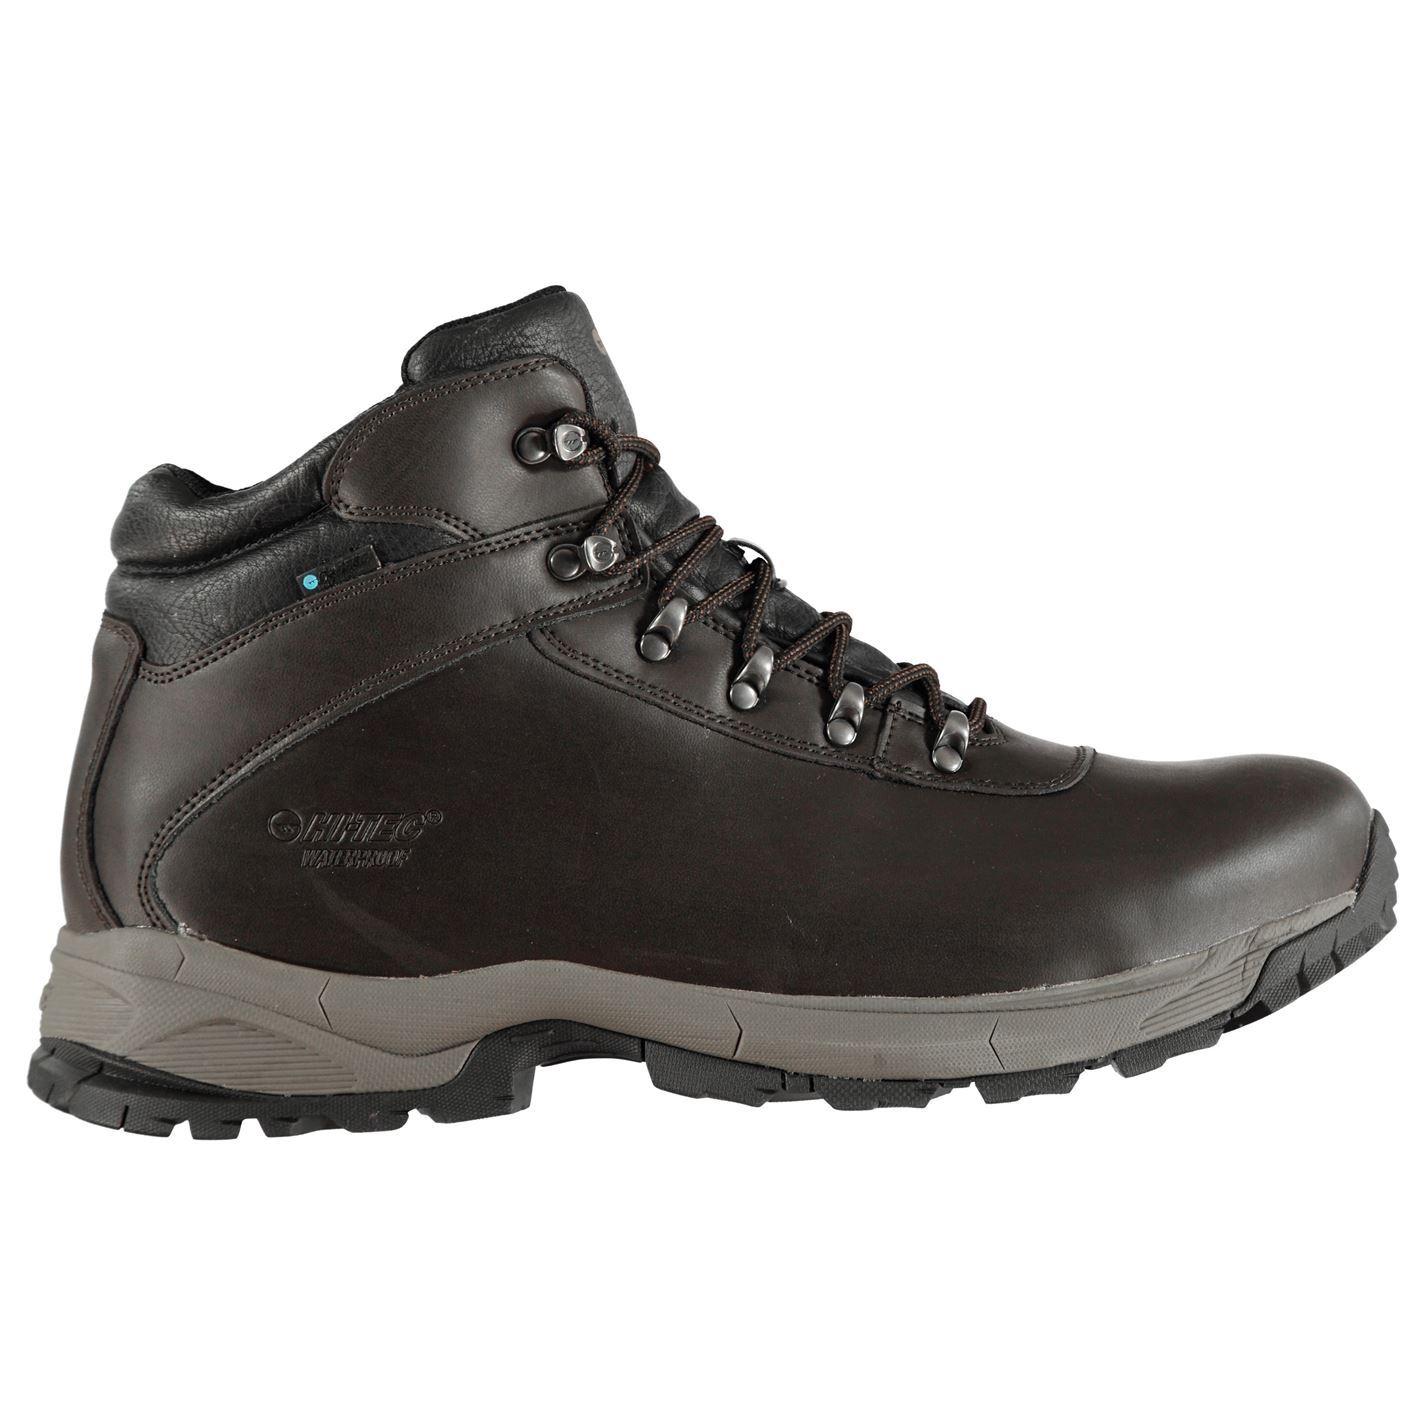 Hi-Tec Mens Eurotrek Lite Waterproof Walking Boots Hiking Outdoor Trail Trekking